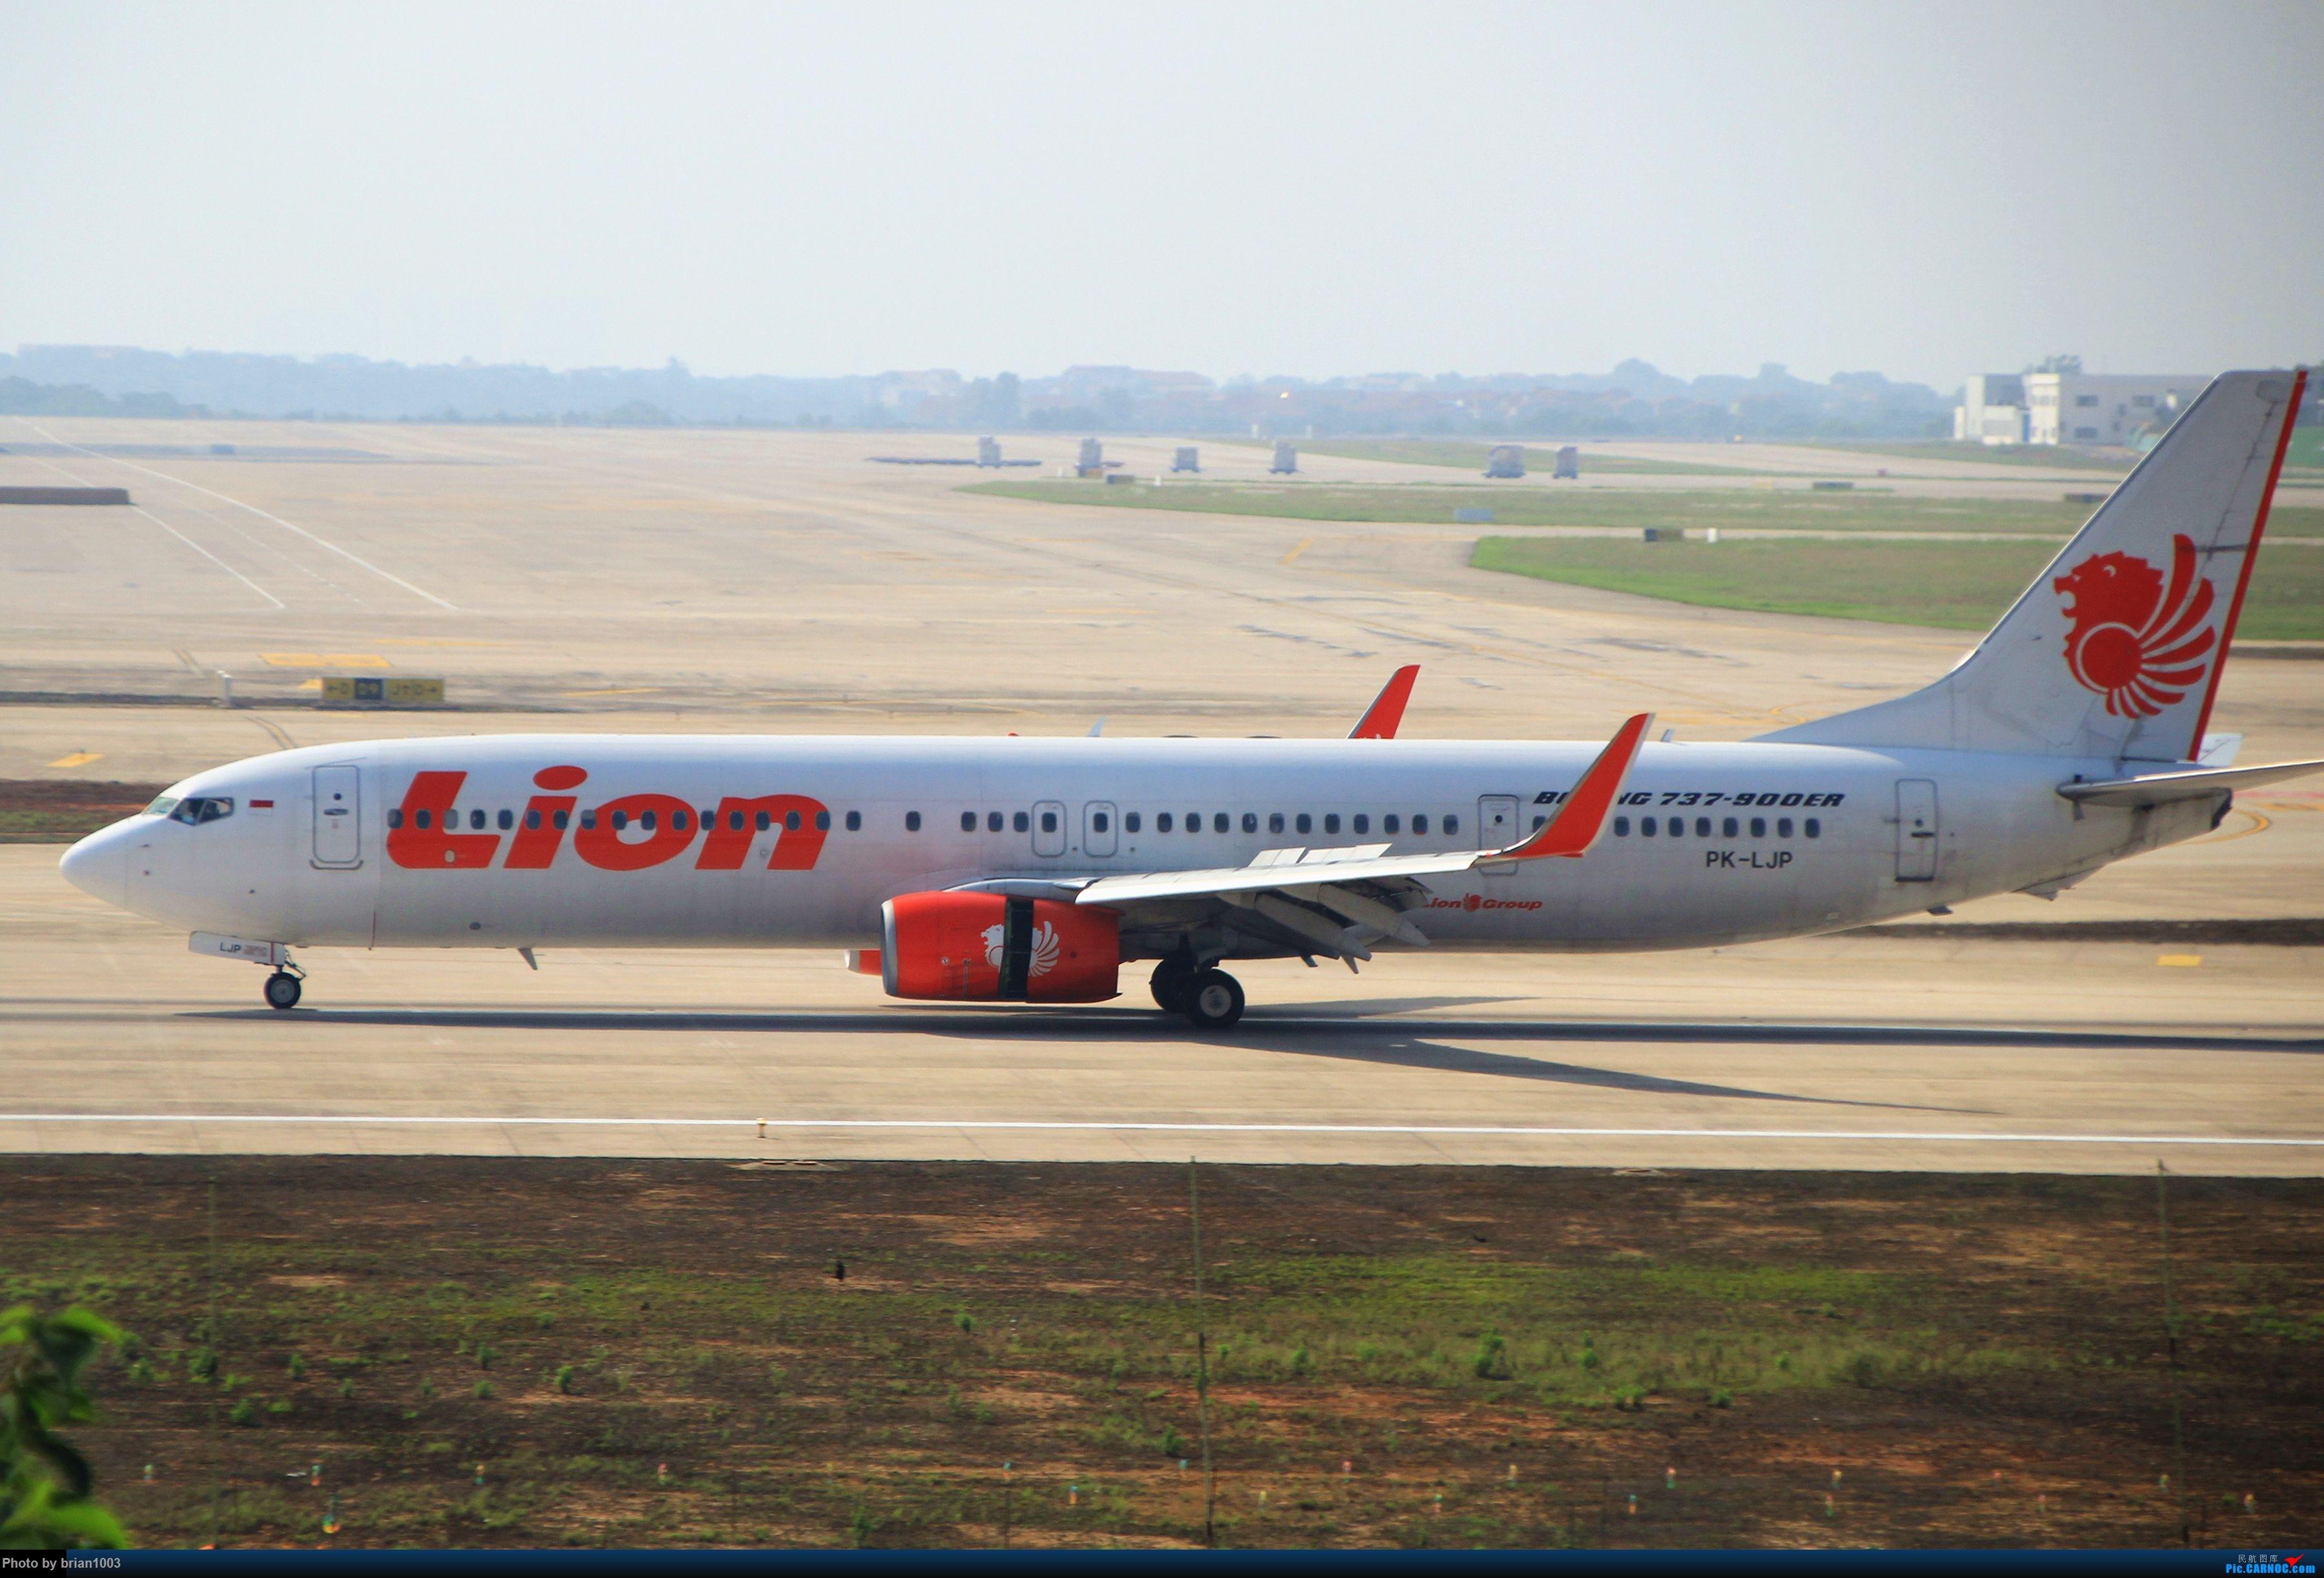 Re:[原创]WUH武汉天河机场拍机之喜迎酷航788和偶遇某其他飞机 BOEING 737-900ER PK-LJP WUH